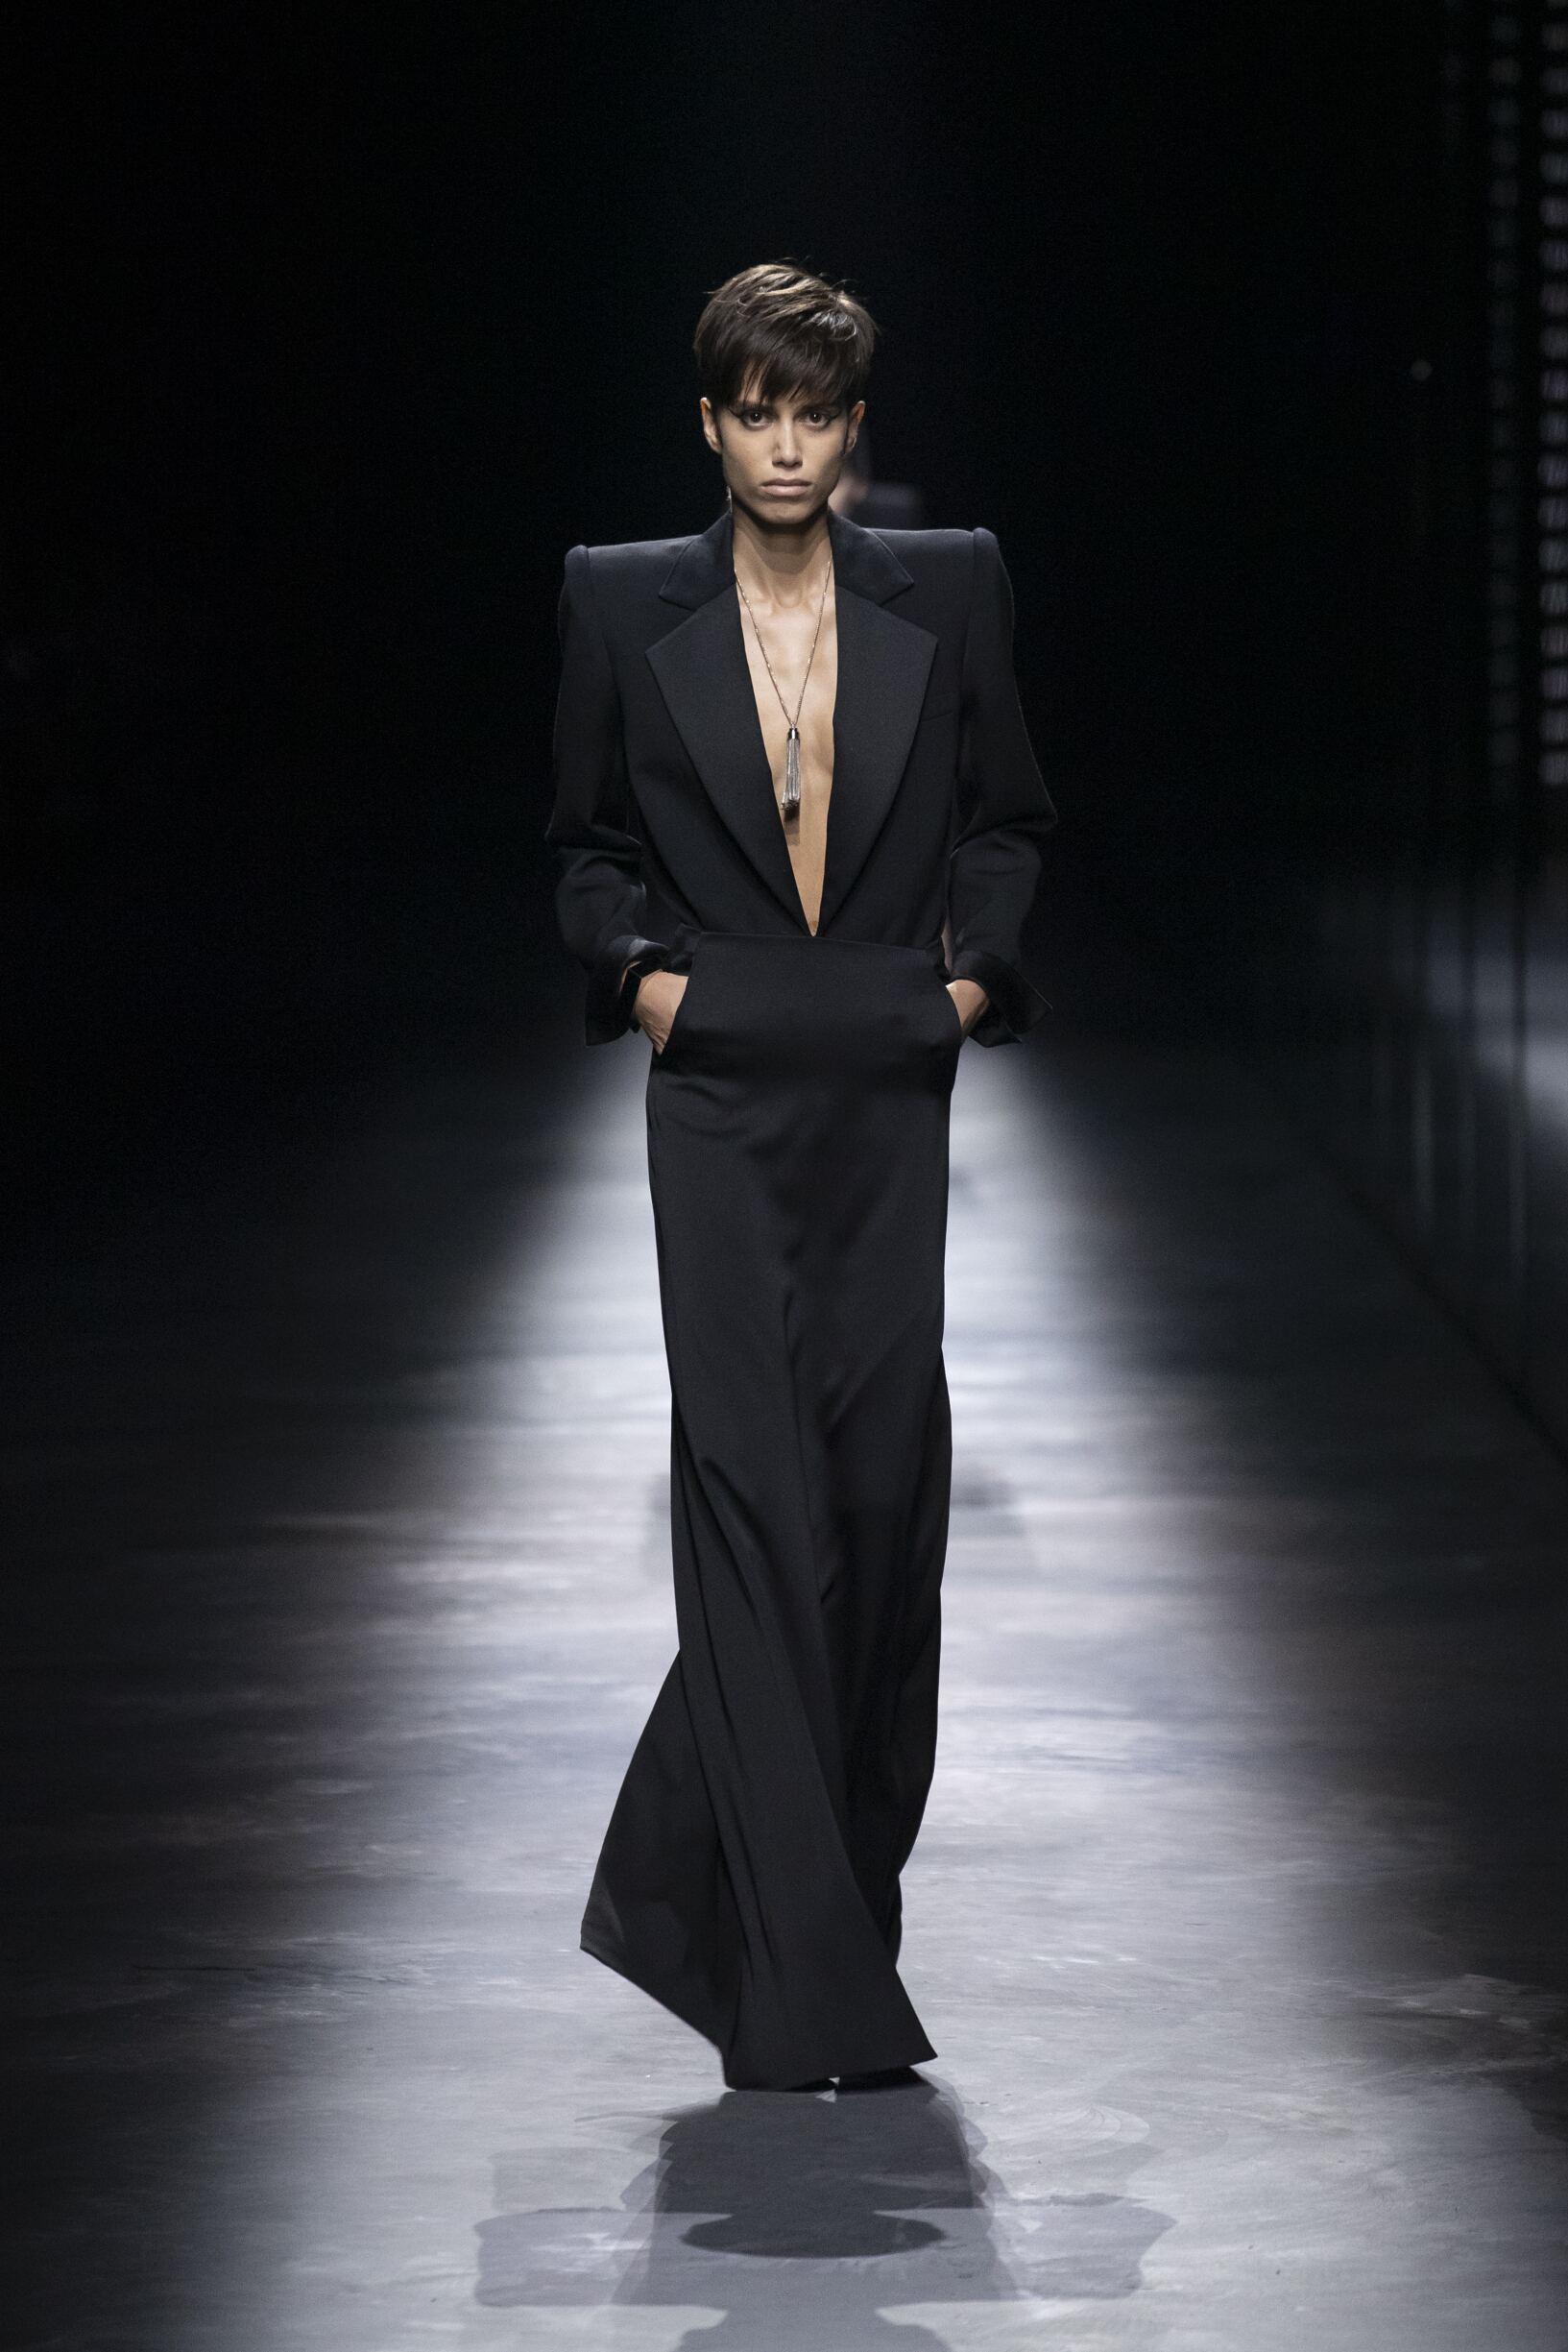 Womenswear Fashion 2019 20 Catwalk Saint Laurent